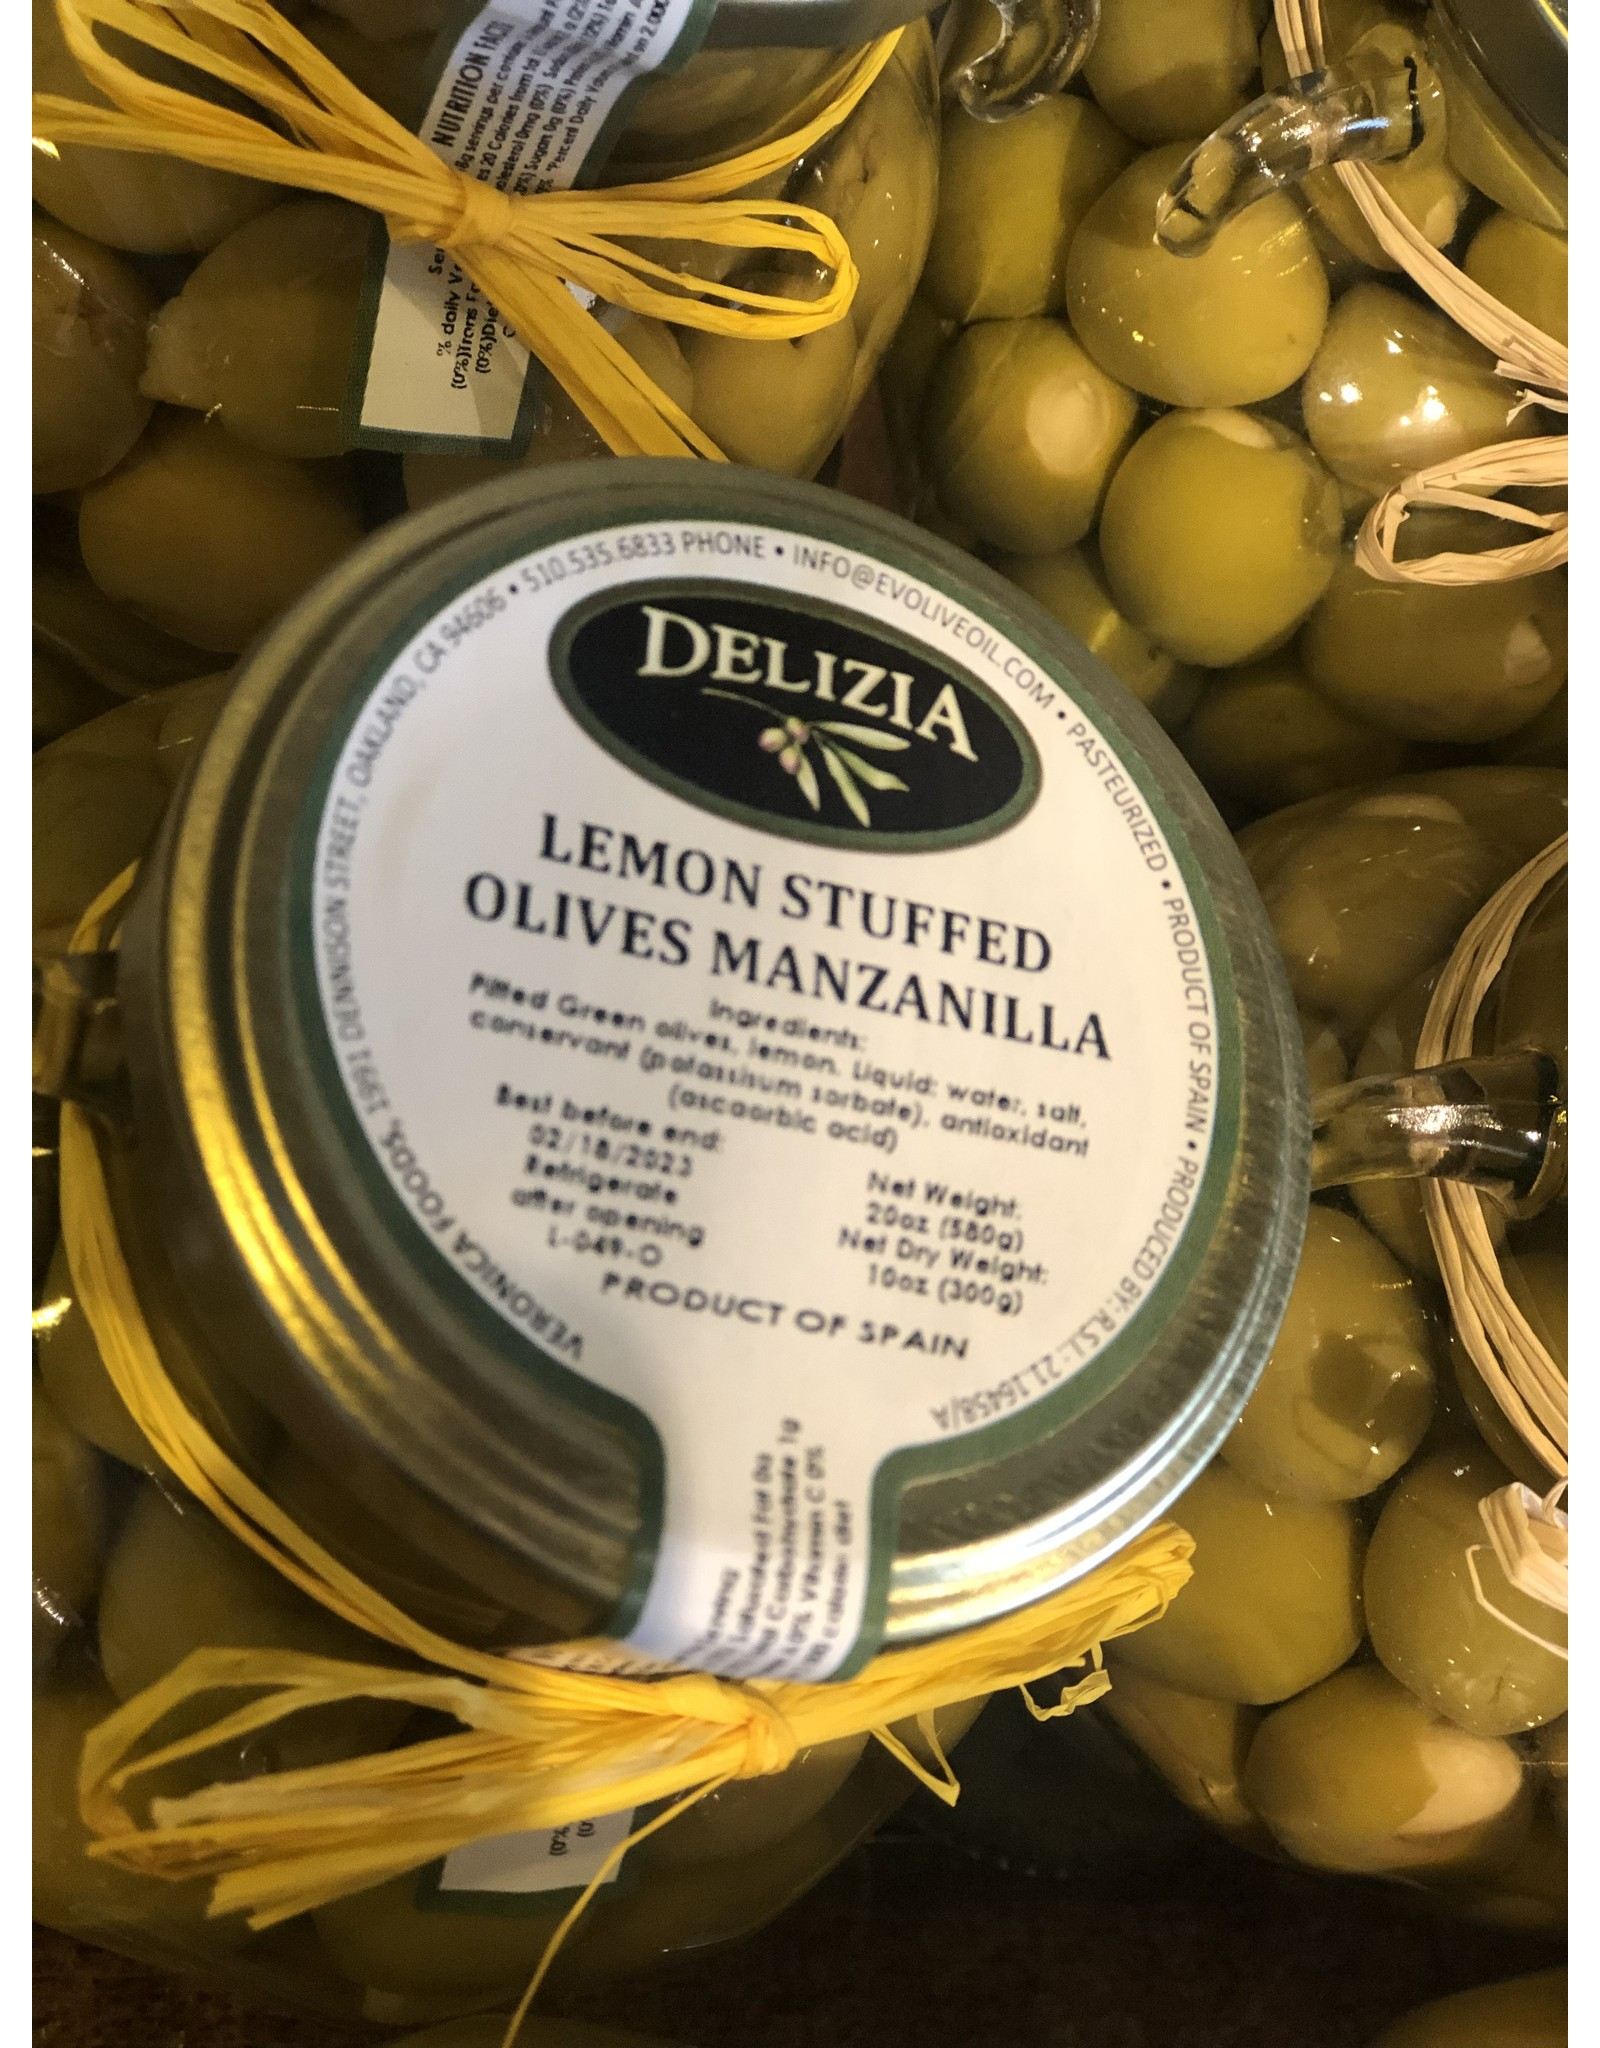 Delizia Manzanilla Olives Stuffed W/Lemon 20 OZ.